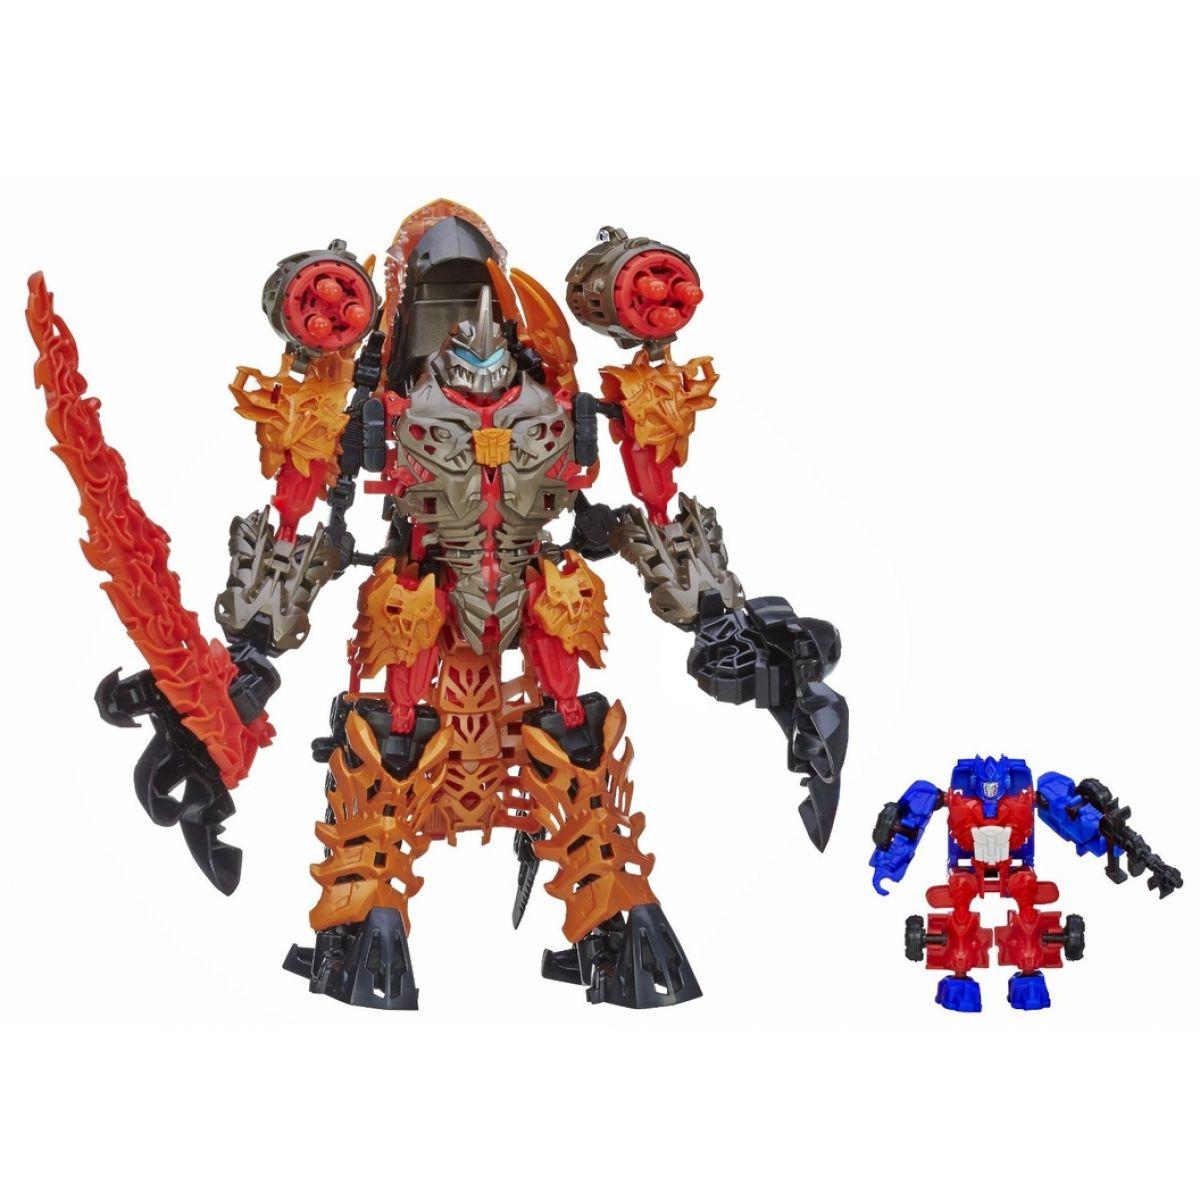 Transformers 4 Construct Bots Dinobot Grimlock